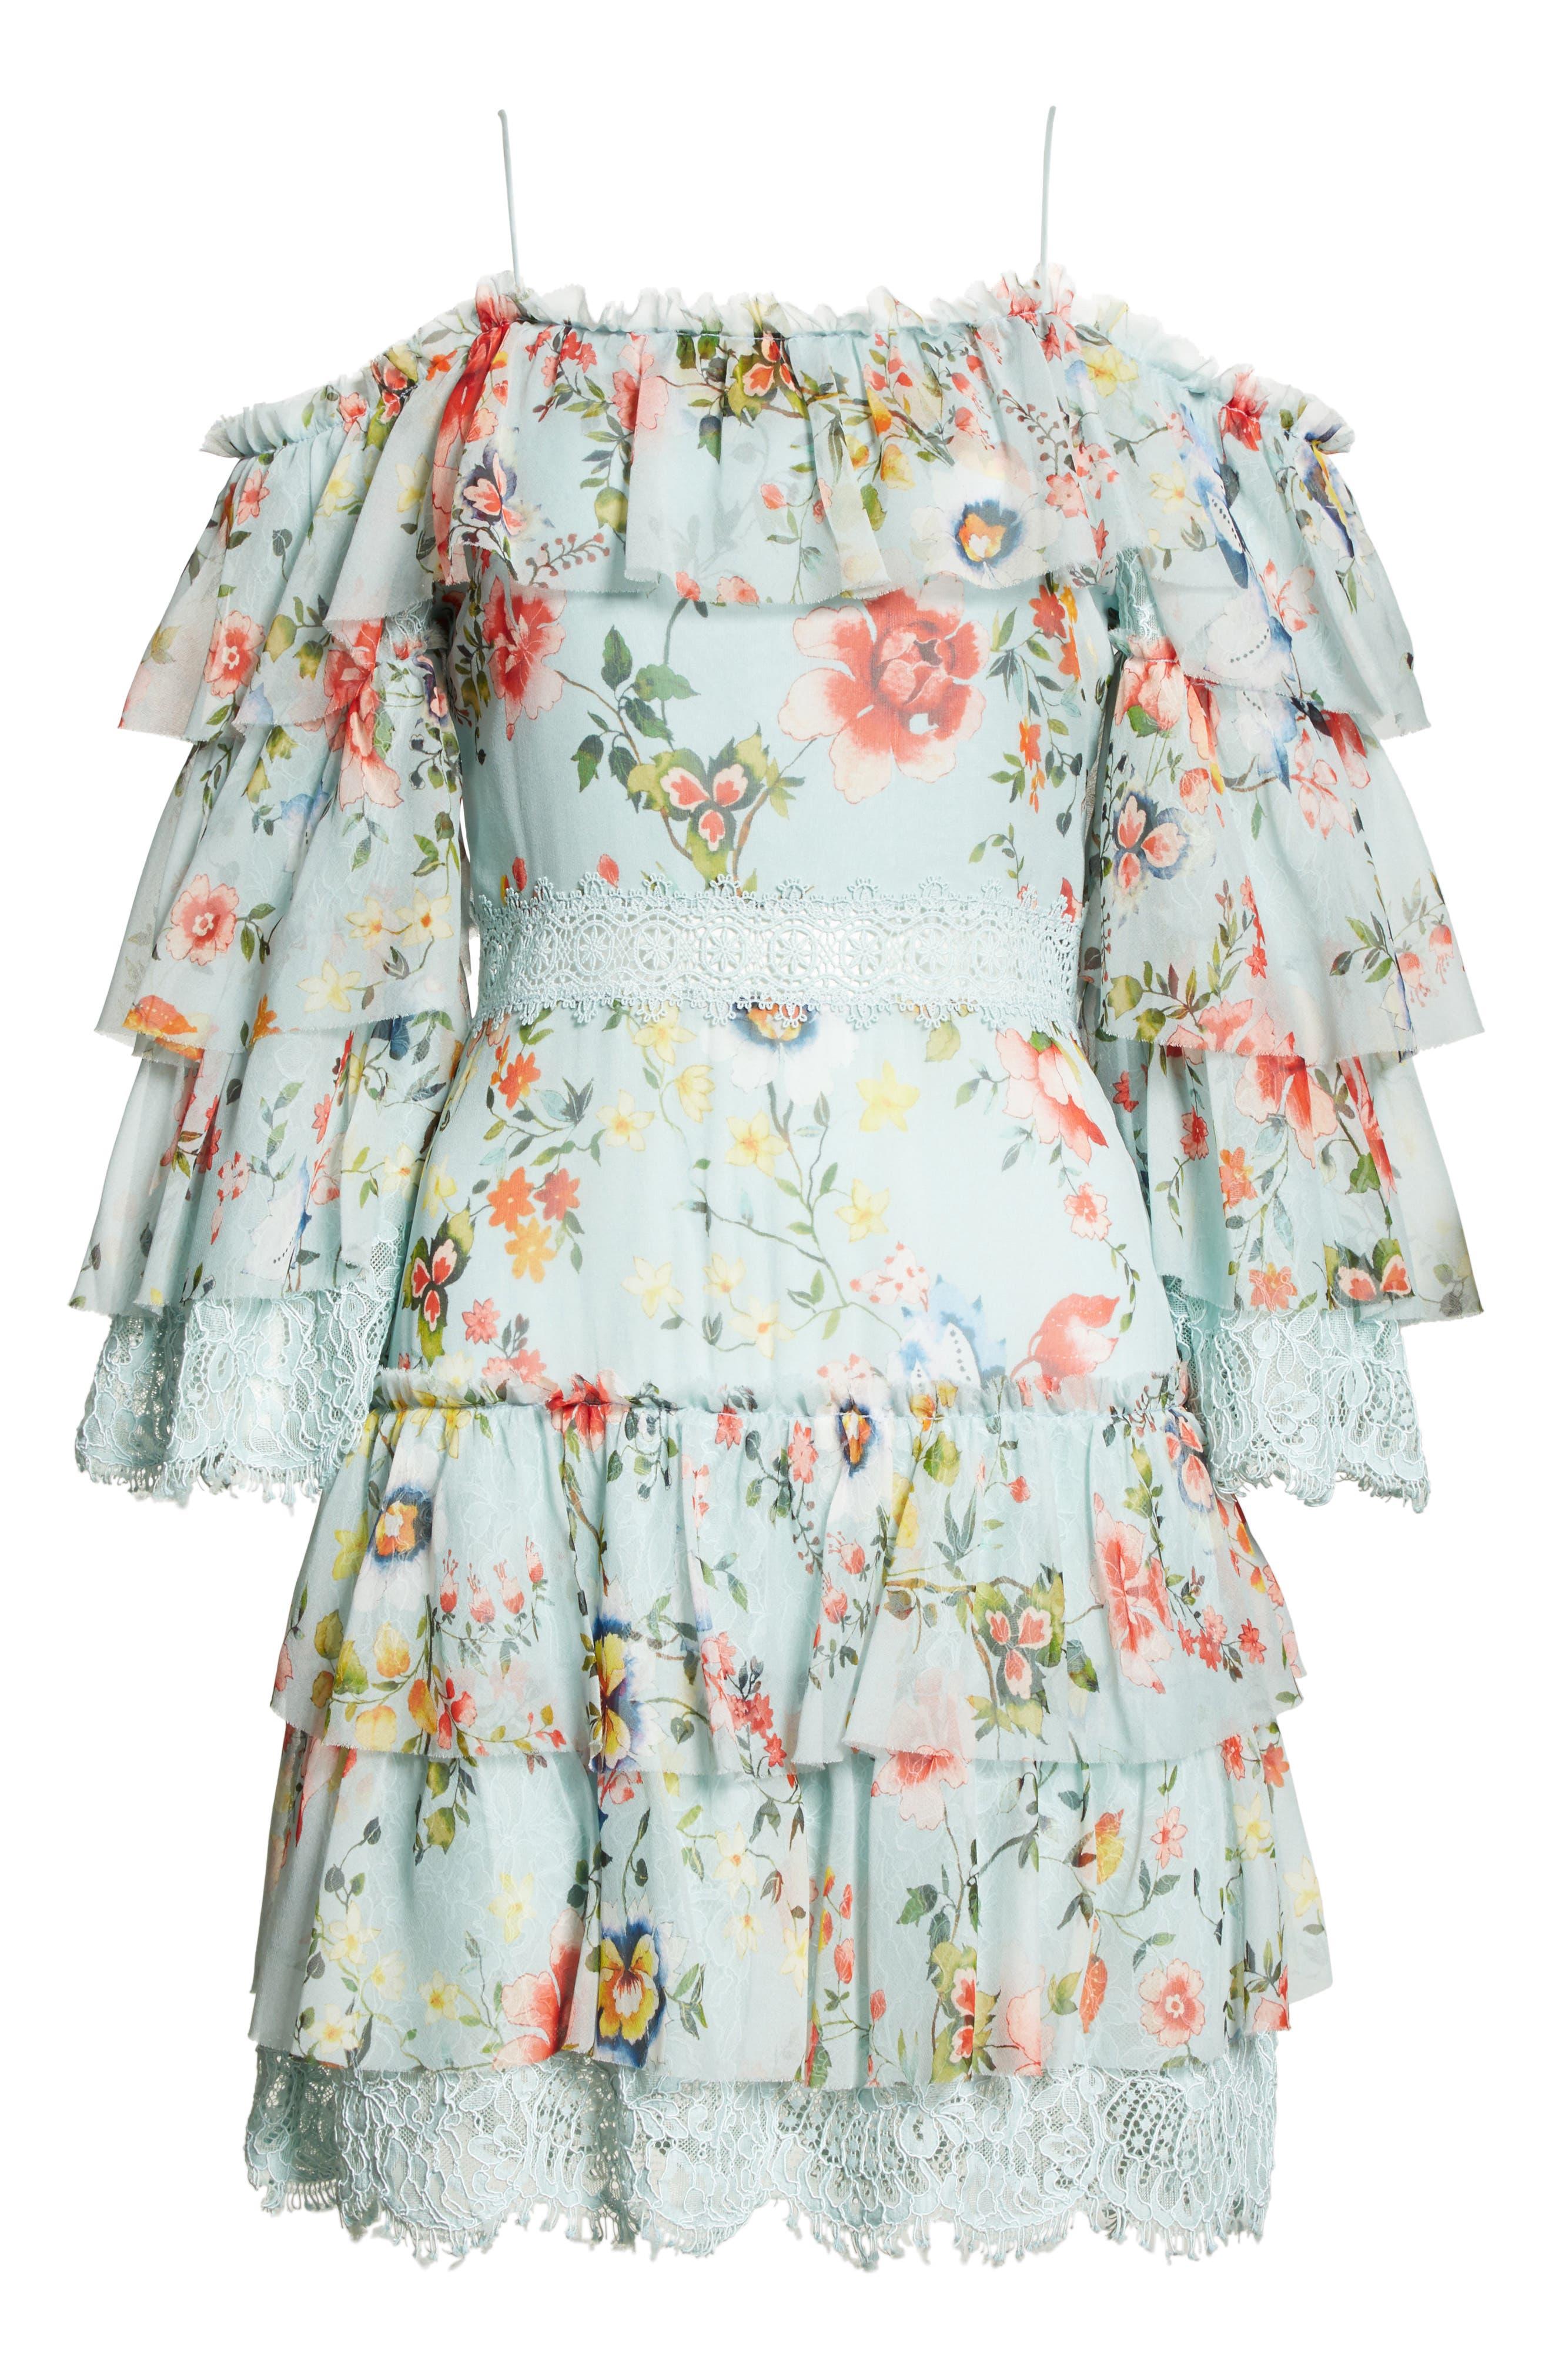 Santos Cold Shoulder Tiered Silk Dress,                             Alternate thumbnail 6, color,                             Floral Soiree-Dusty Aqua